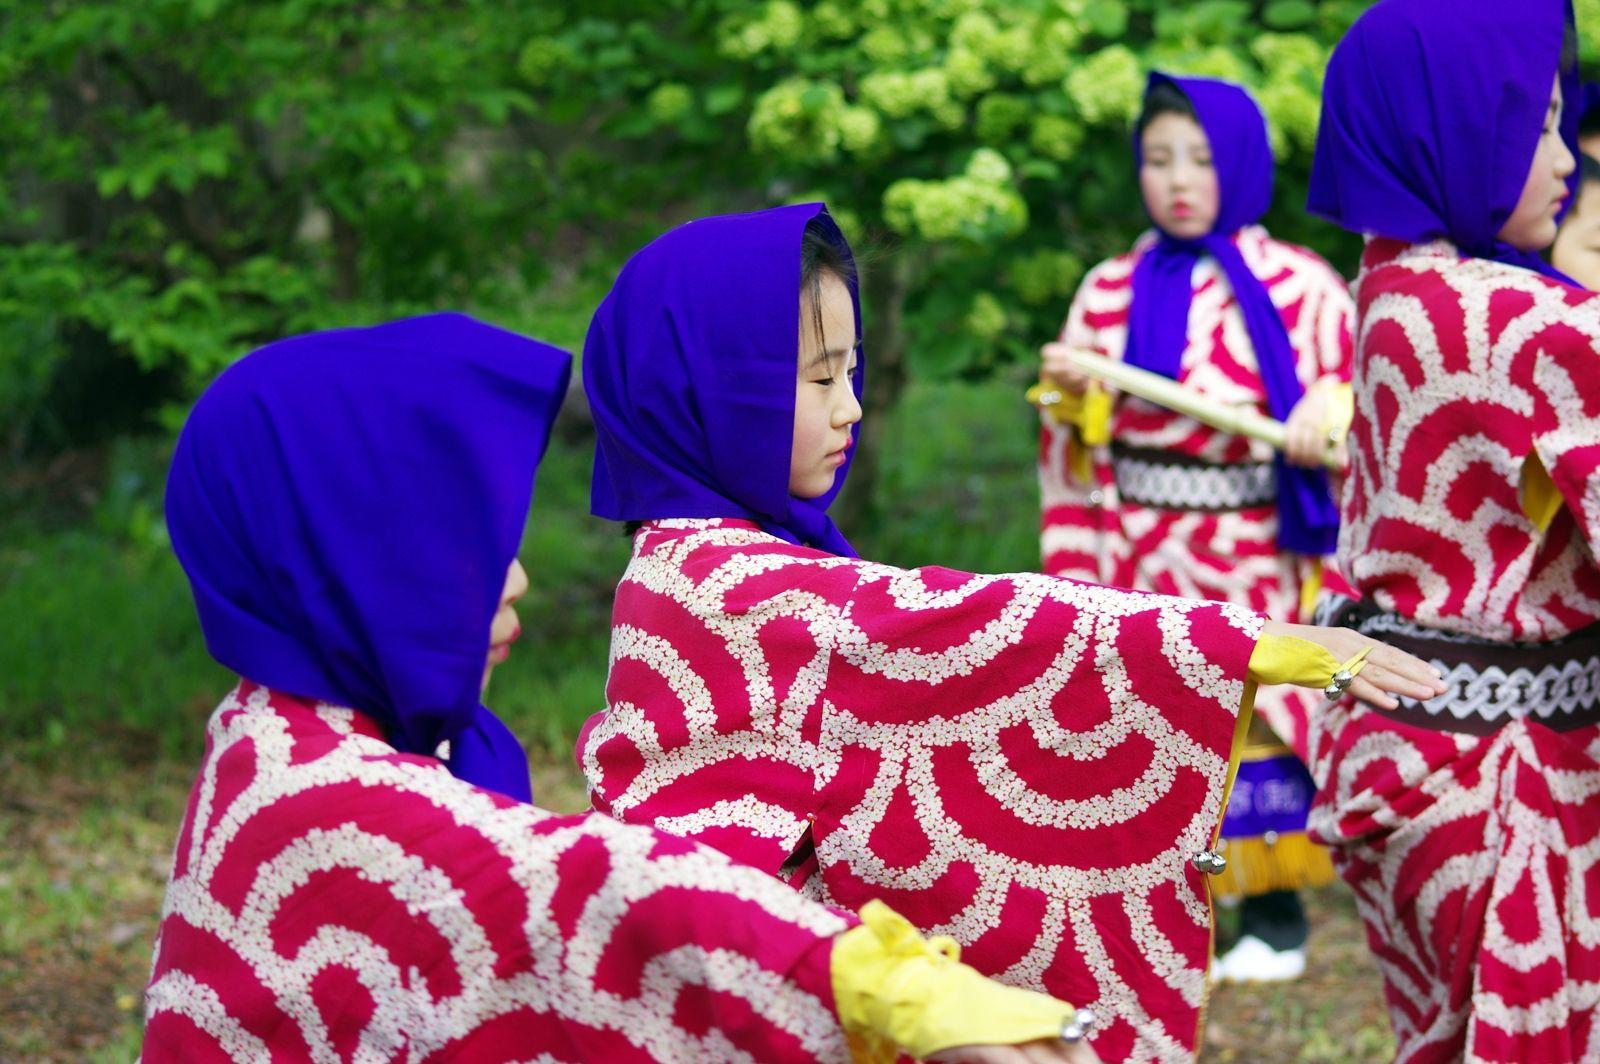 04 Akita Hachirogata town Child Gannin Dance 2015 2015年5月5日 八郎潟町 一日市神社 子供願人踊り